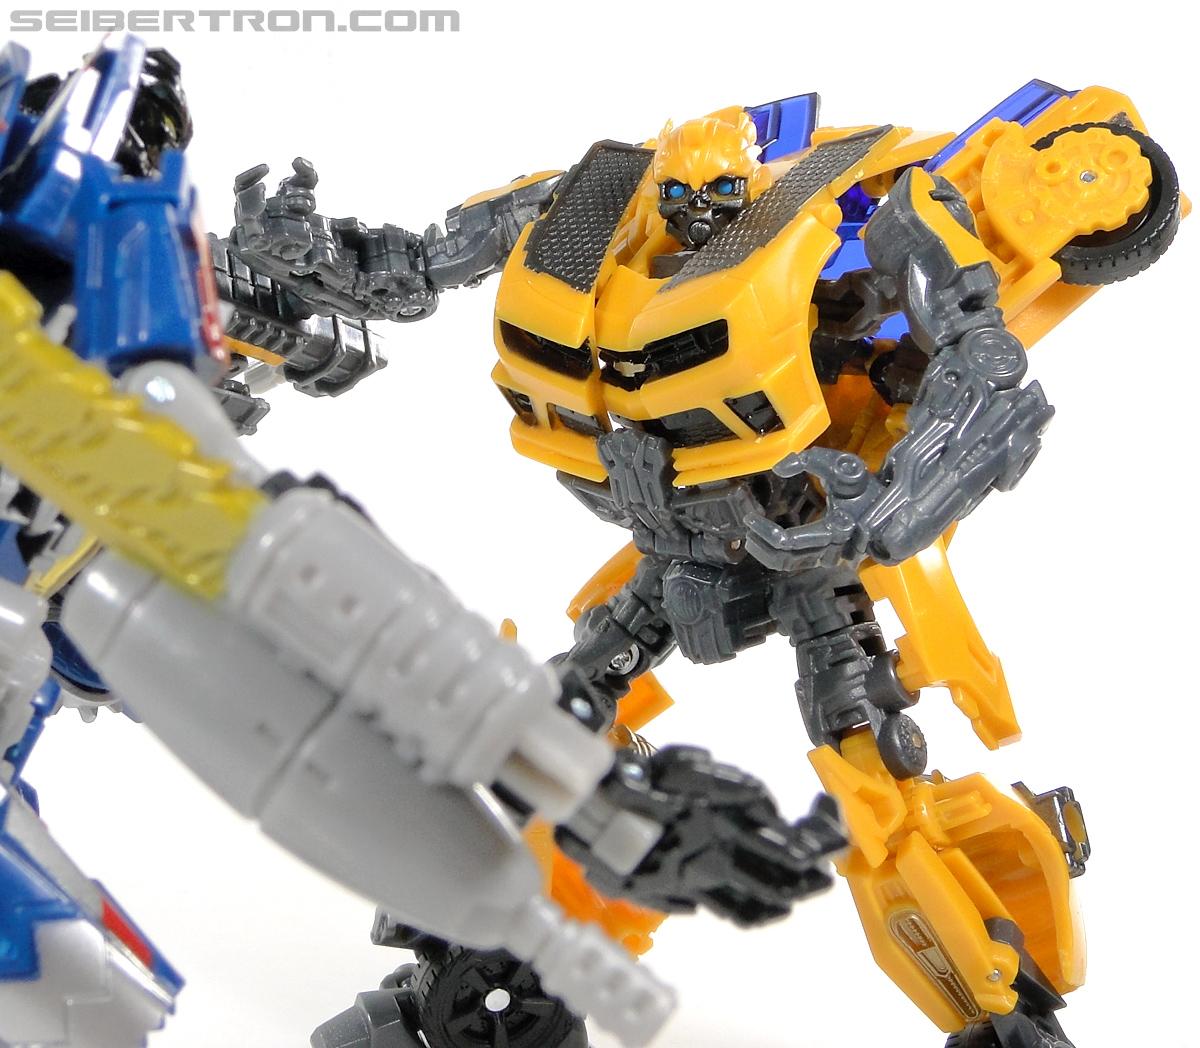 Transformers Dark of the Moon Nitro Bumblebee Toy Gallery ...